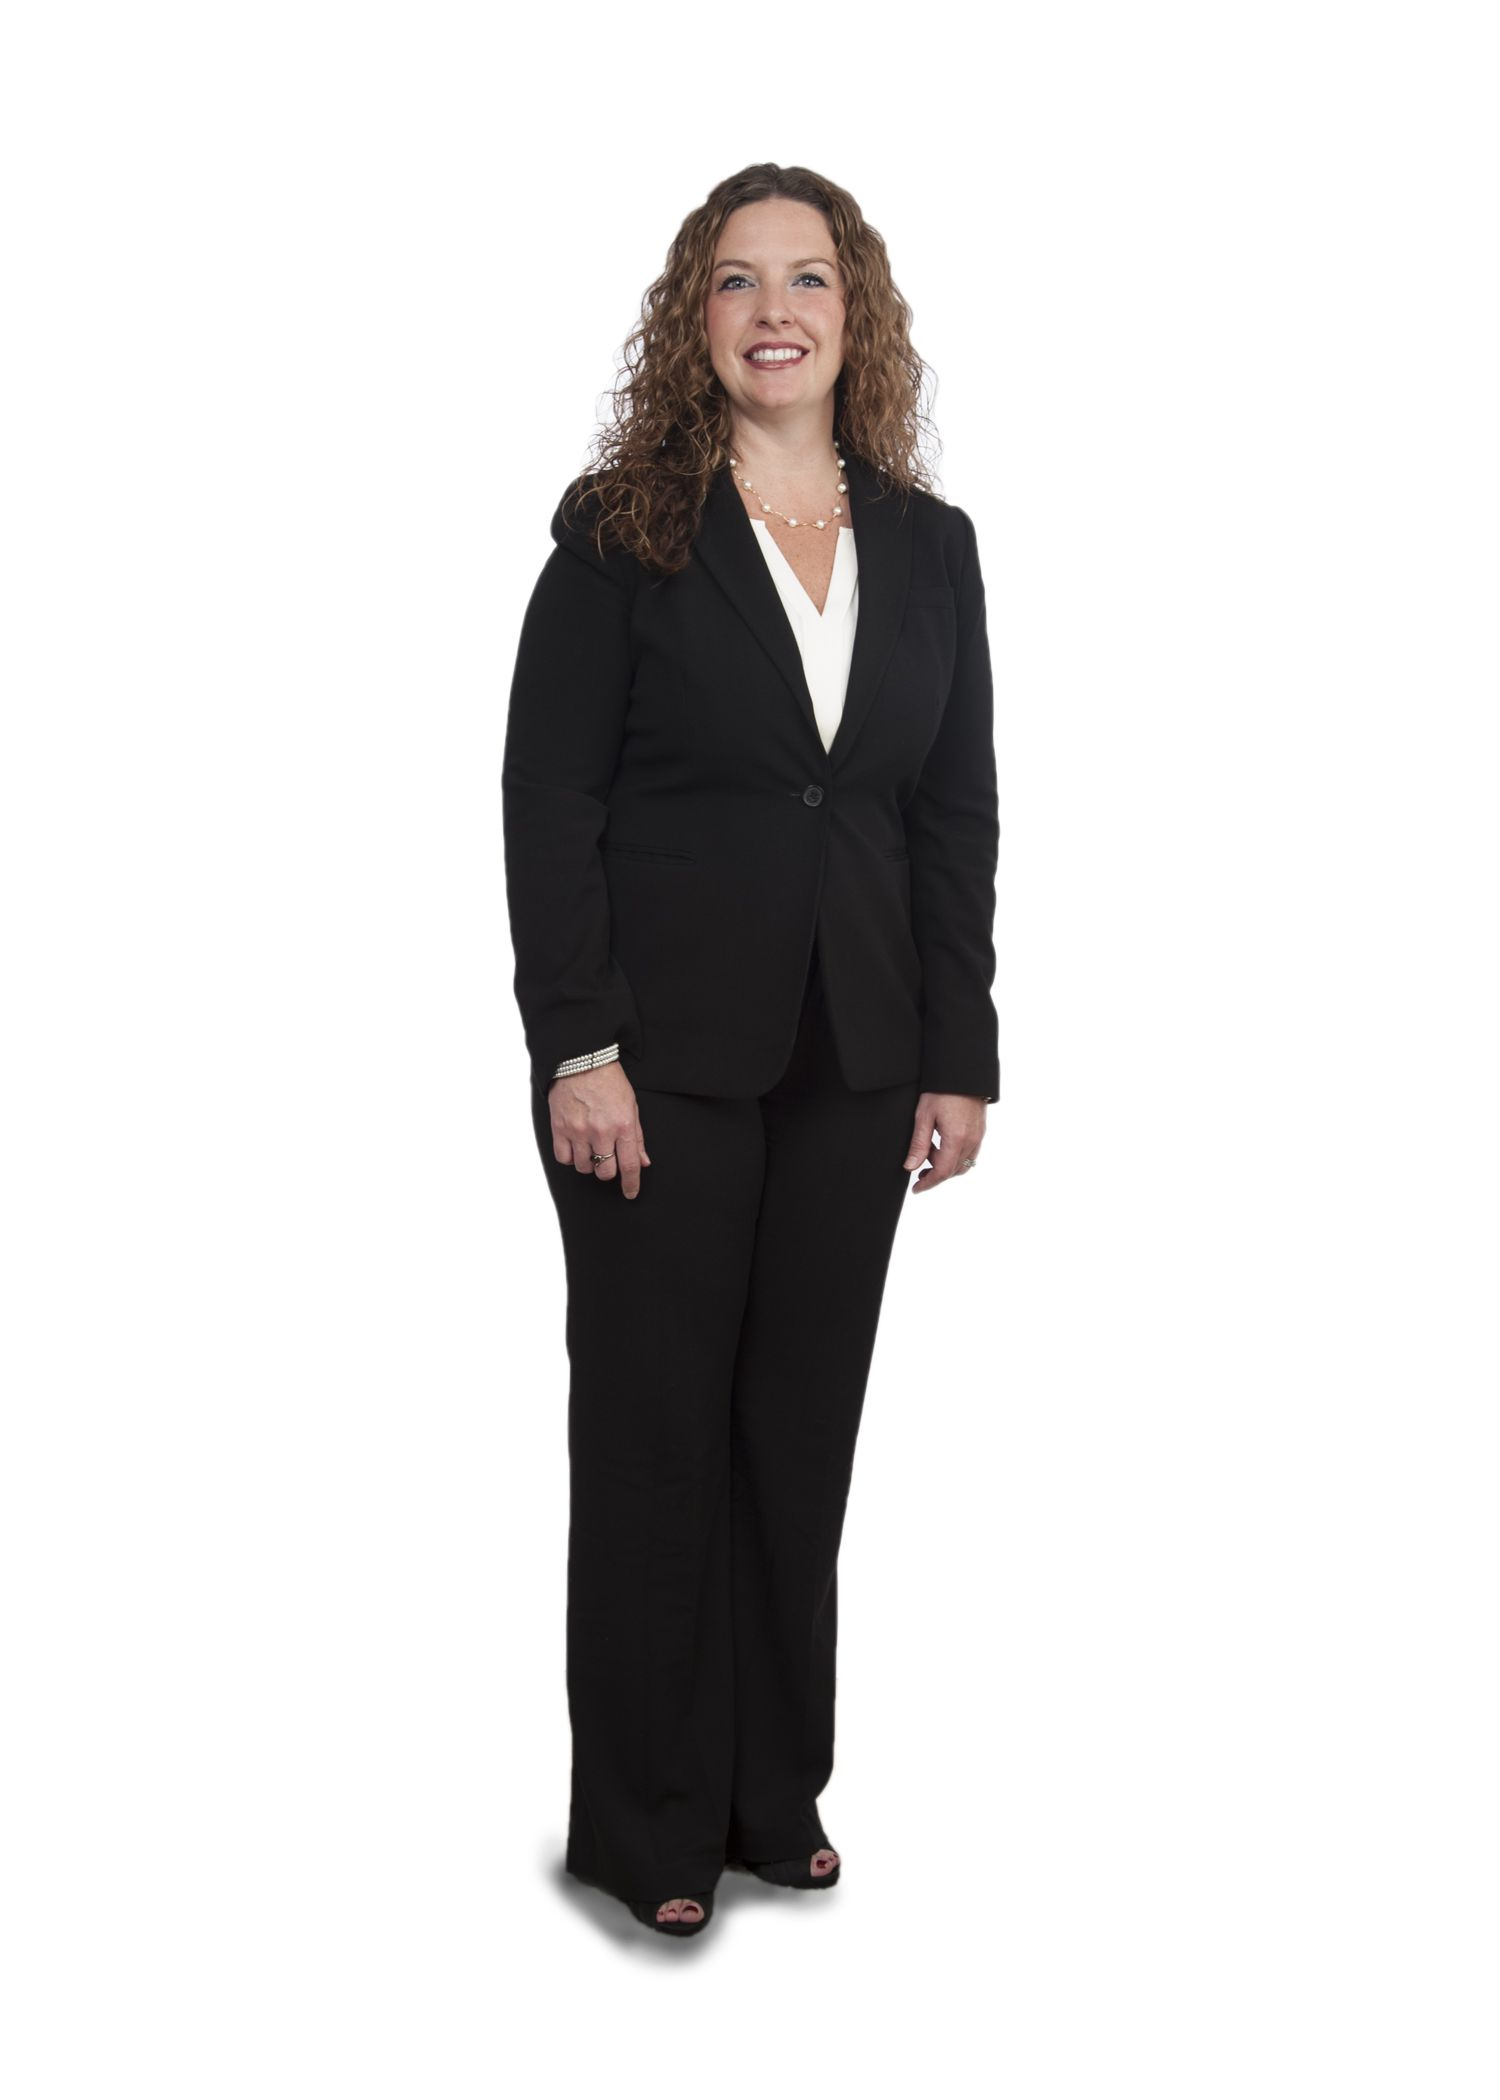 Best Personal Injury Lawyer Attorney Galveston Texas tx